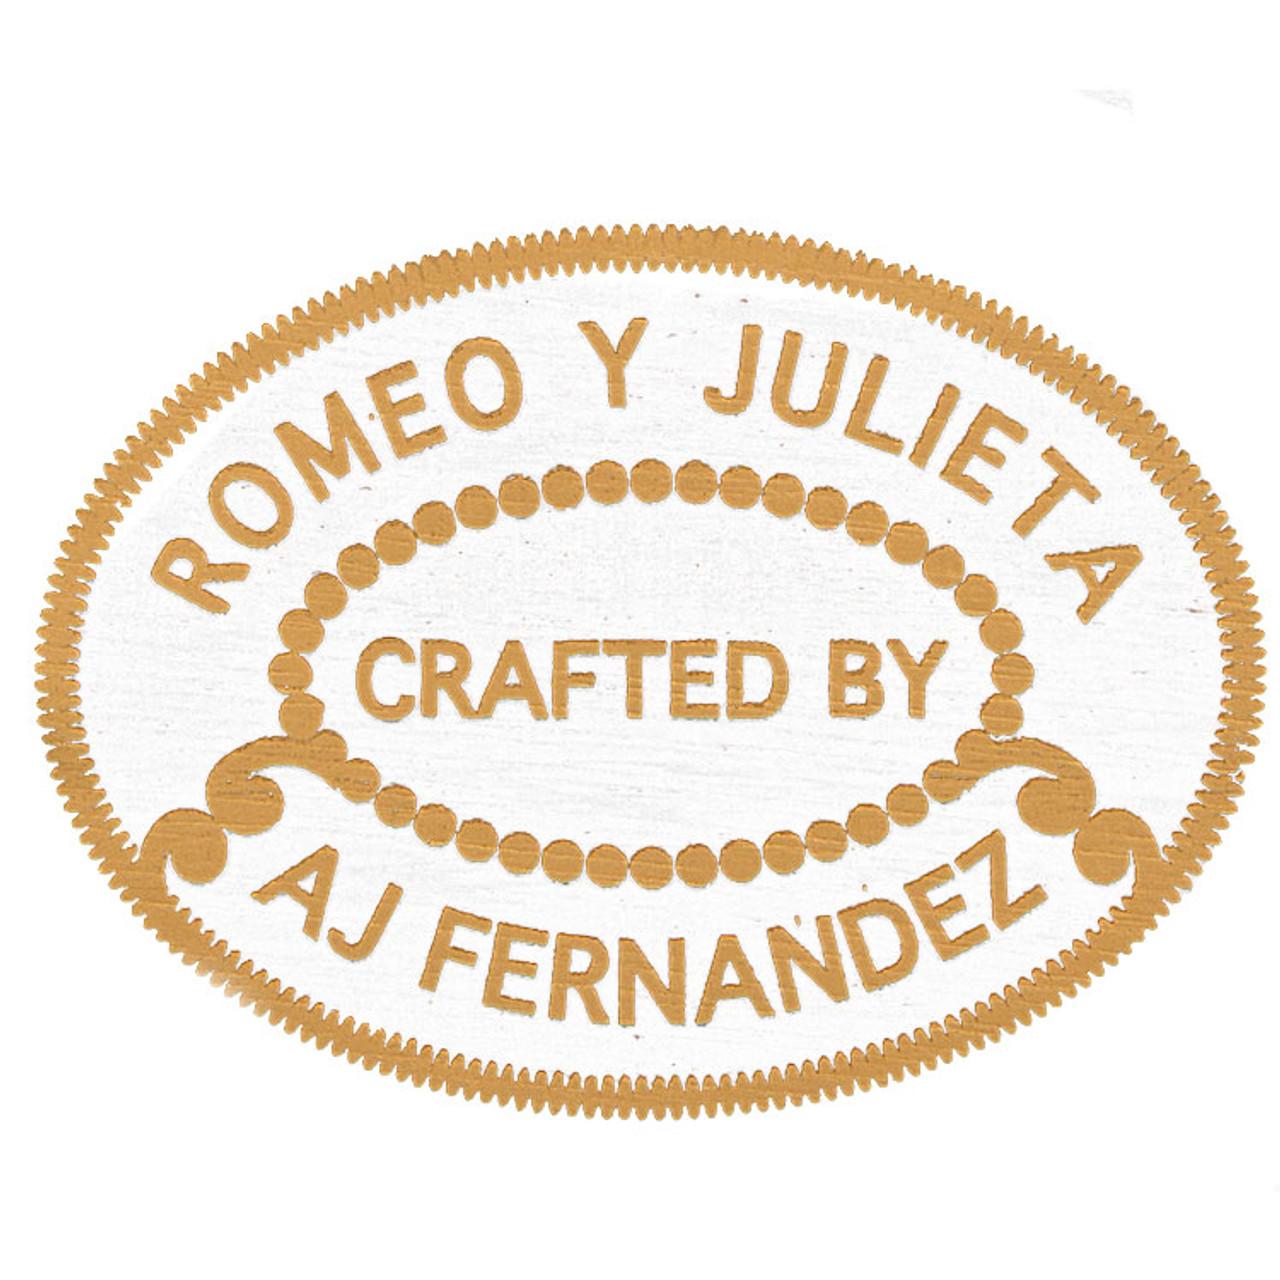 Romeo y Julieta by A.J. Fernandez Belicoso Cigars - 6 x 52 (Box of 20)